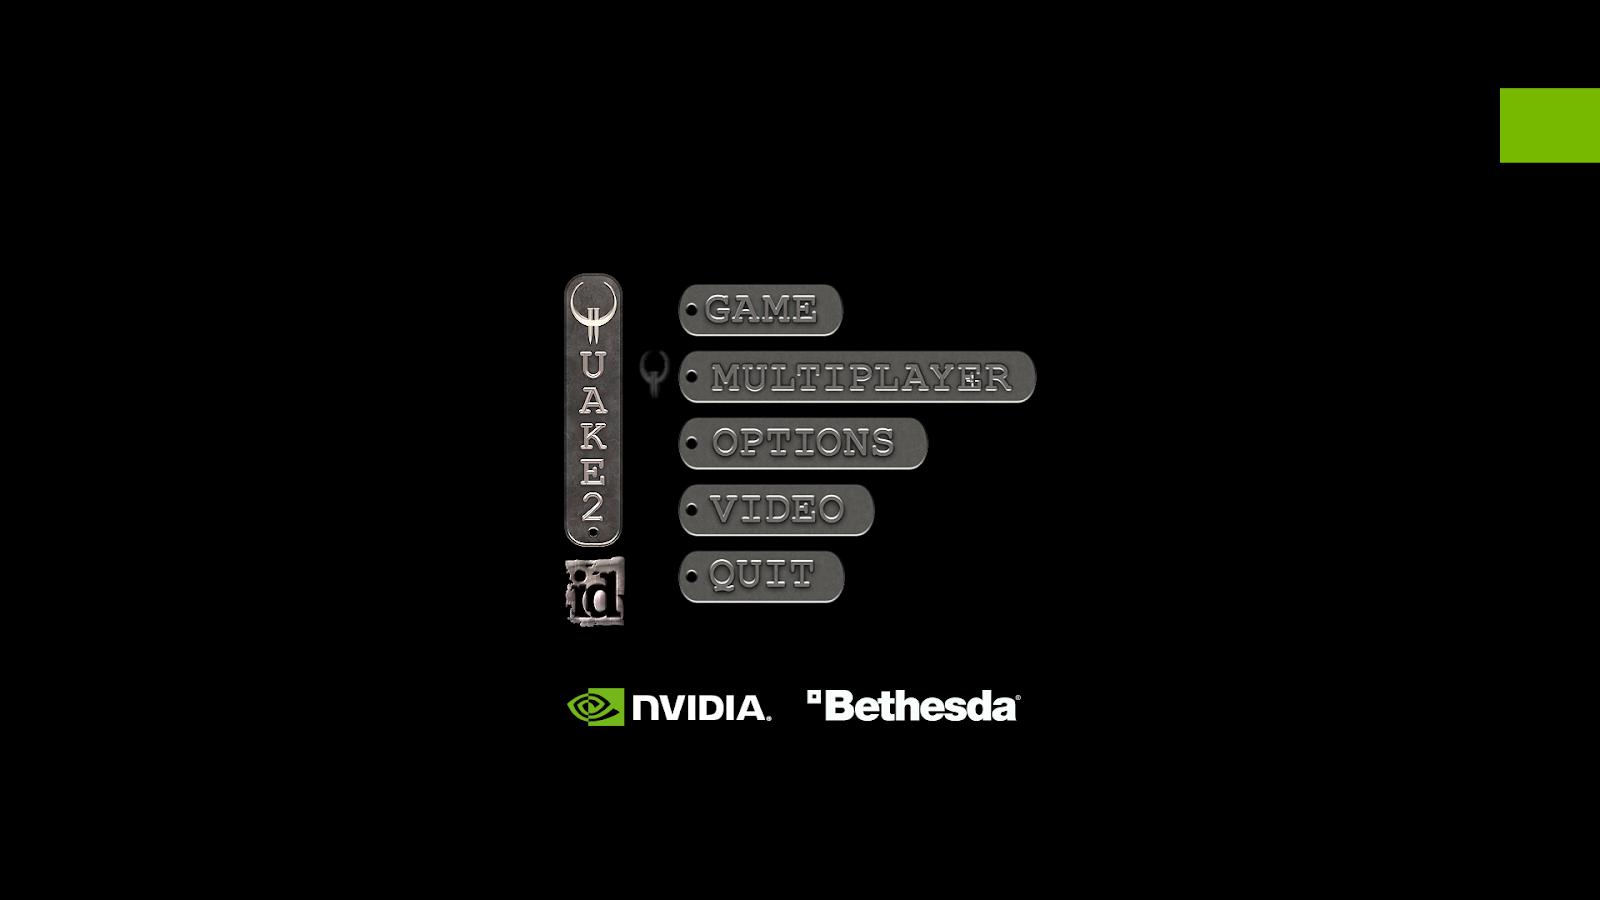 28d31ffecc4040536e8ea3d9c8f2d227f265d4db game art logo